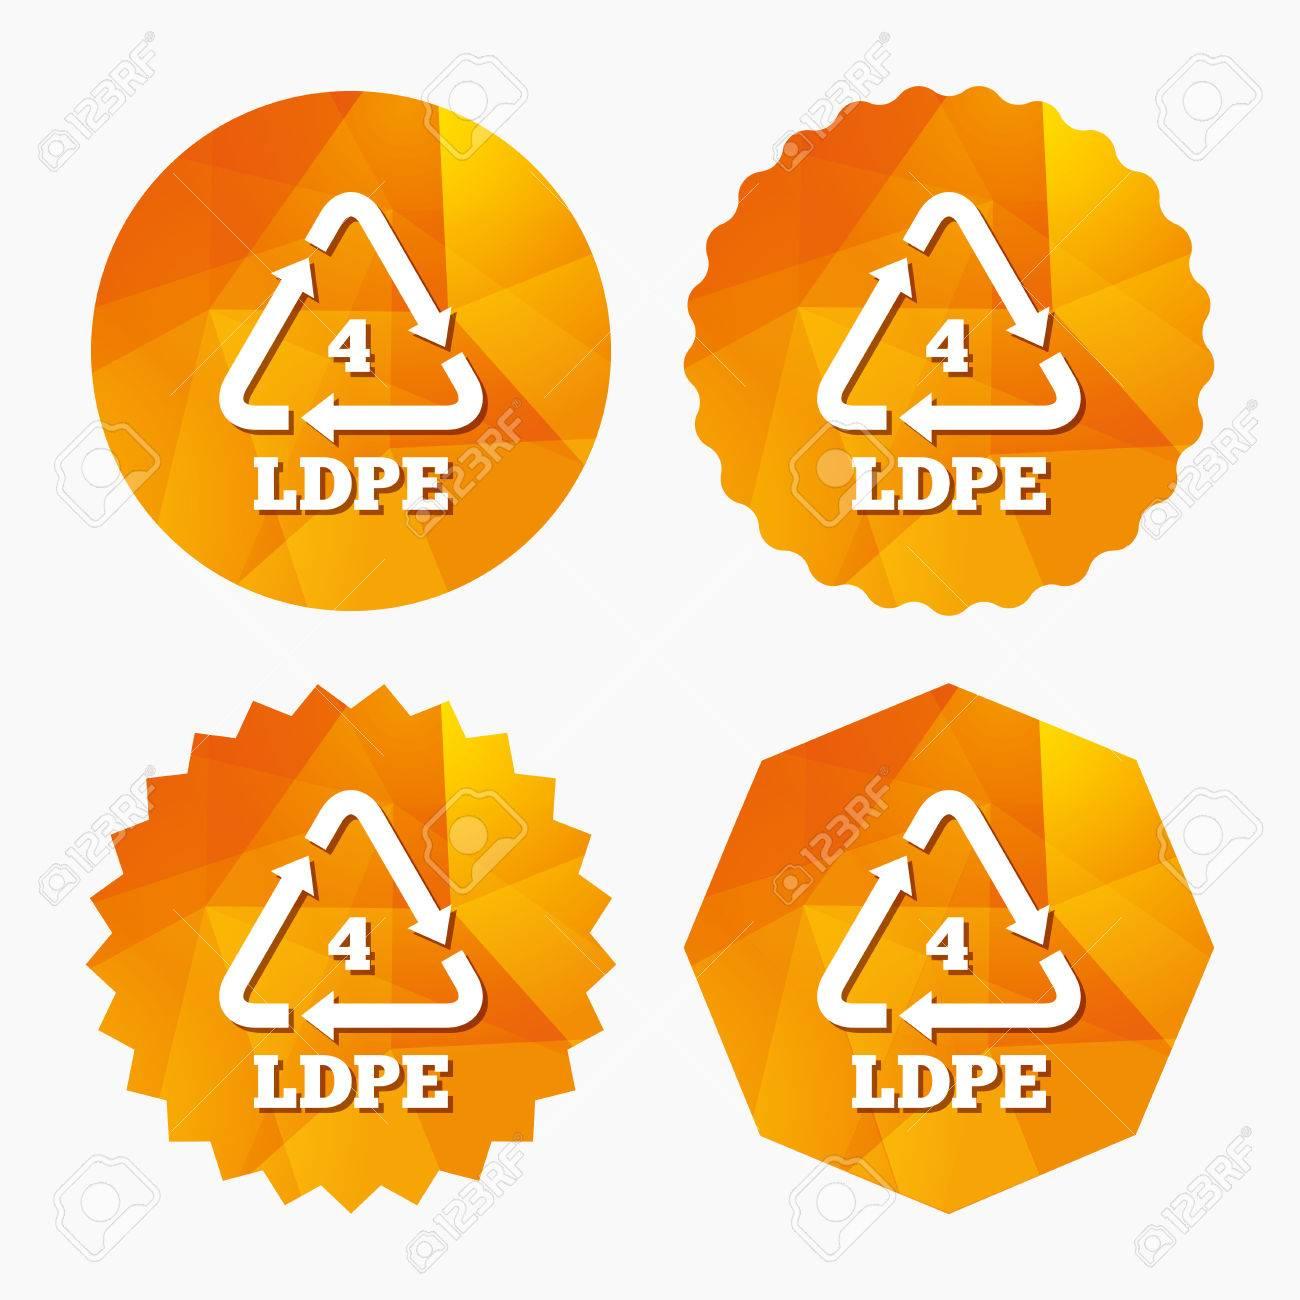 Ld pe 4 icon low density polyethylene sign recycling symbol ld pe 4 icon low density polyethylene sign recycling symbol triangular biocorpaavc Choice Image